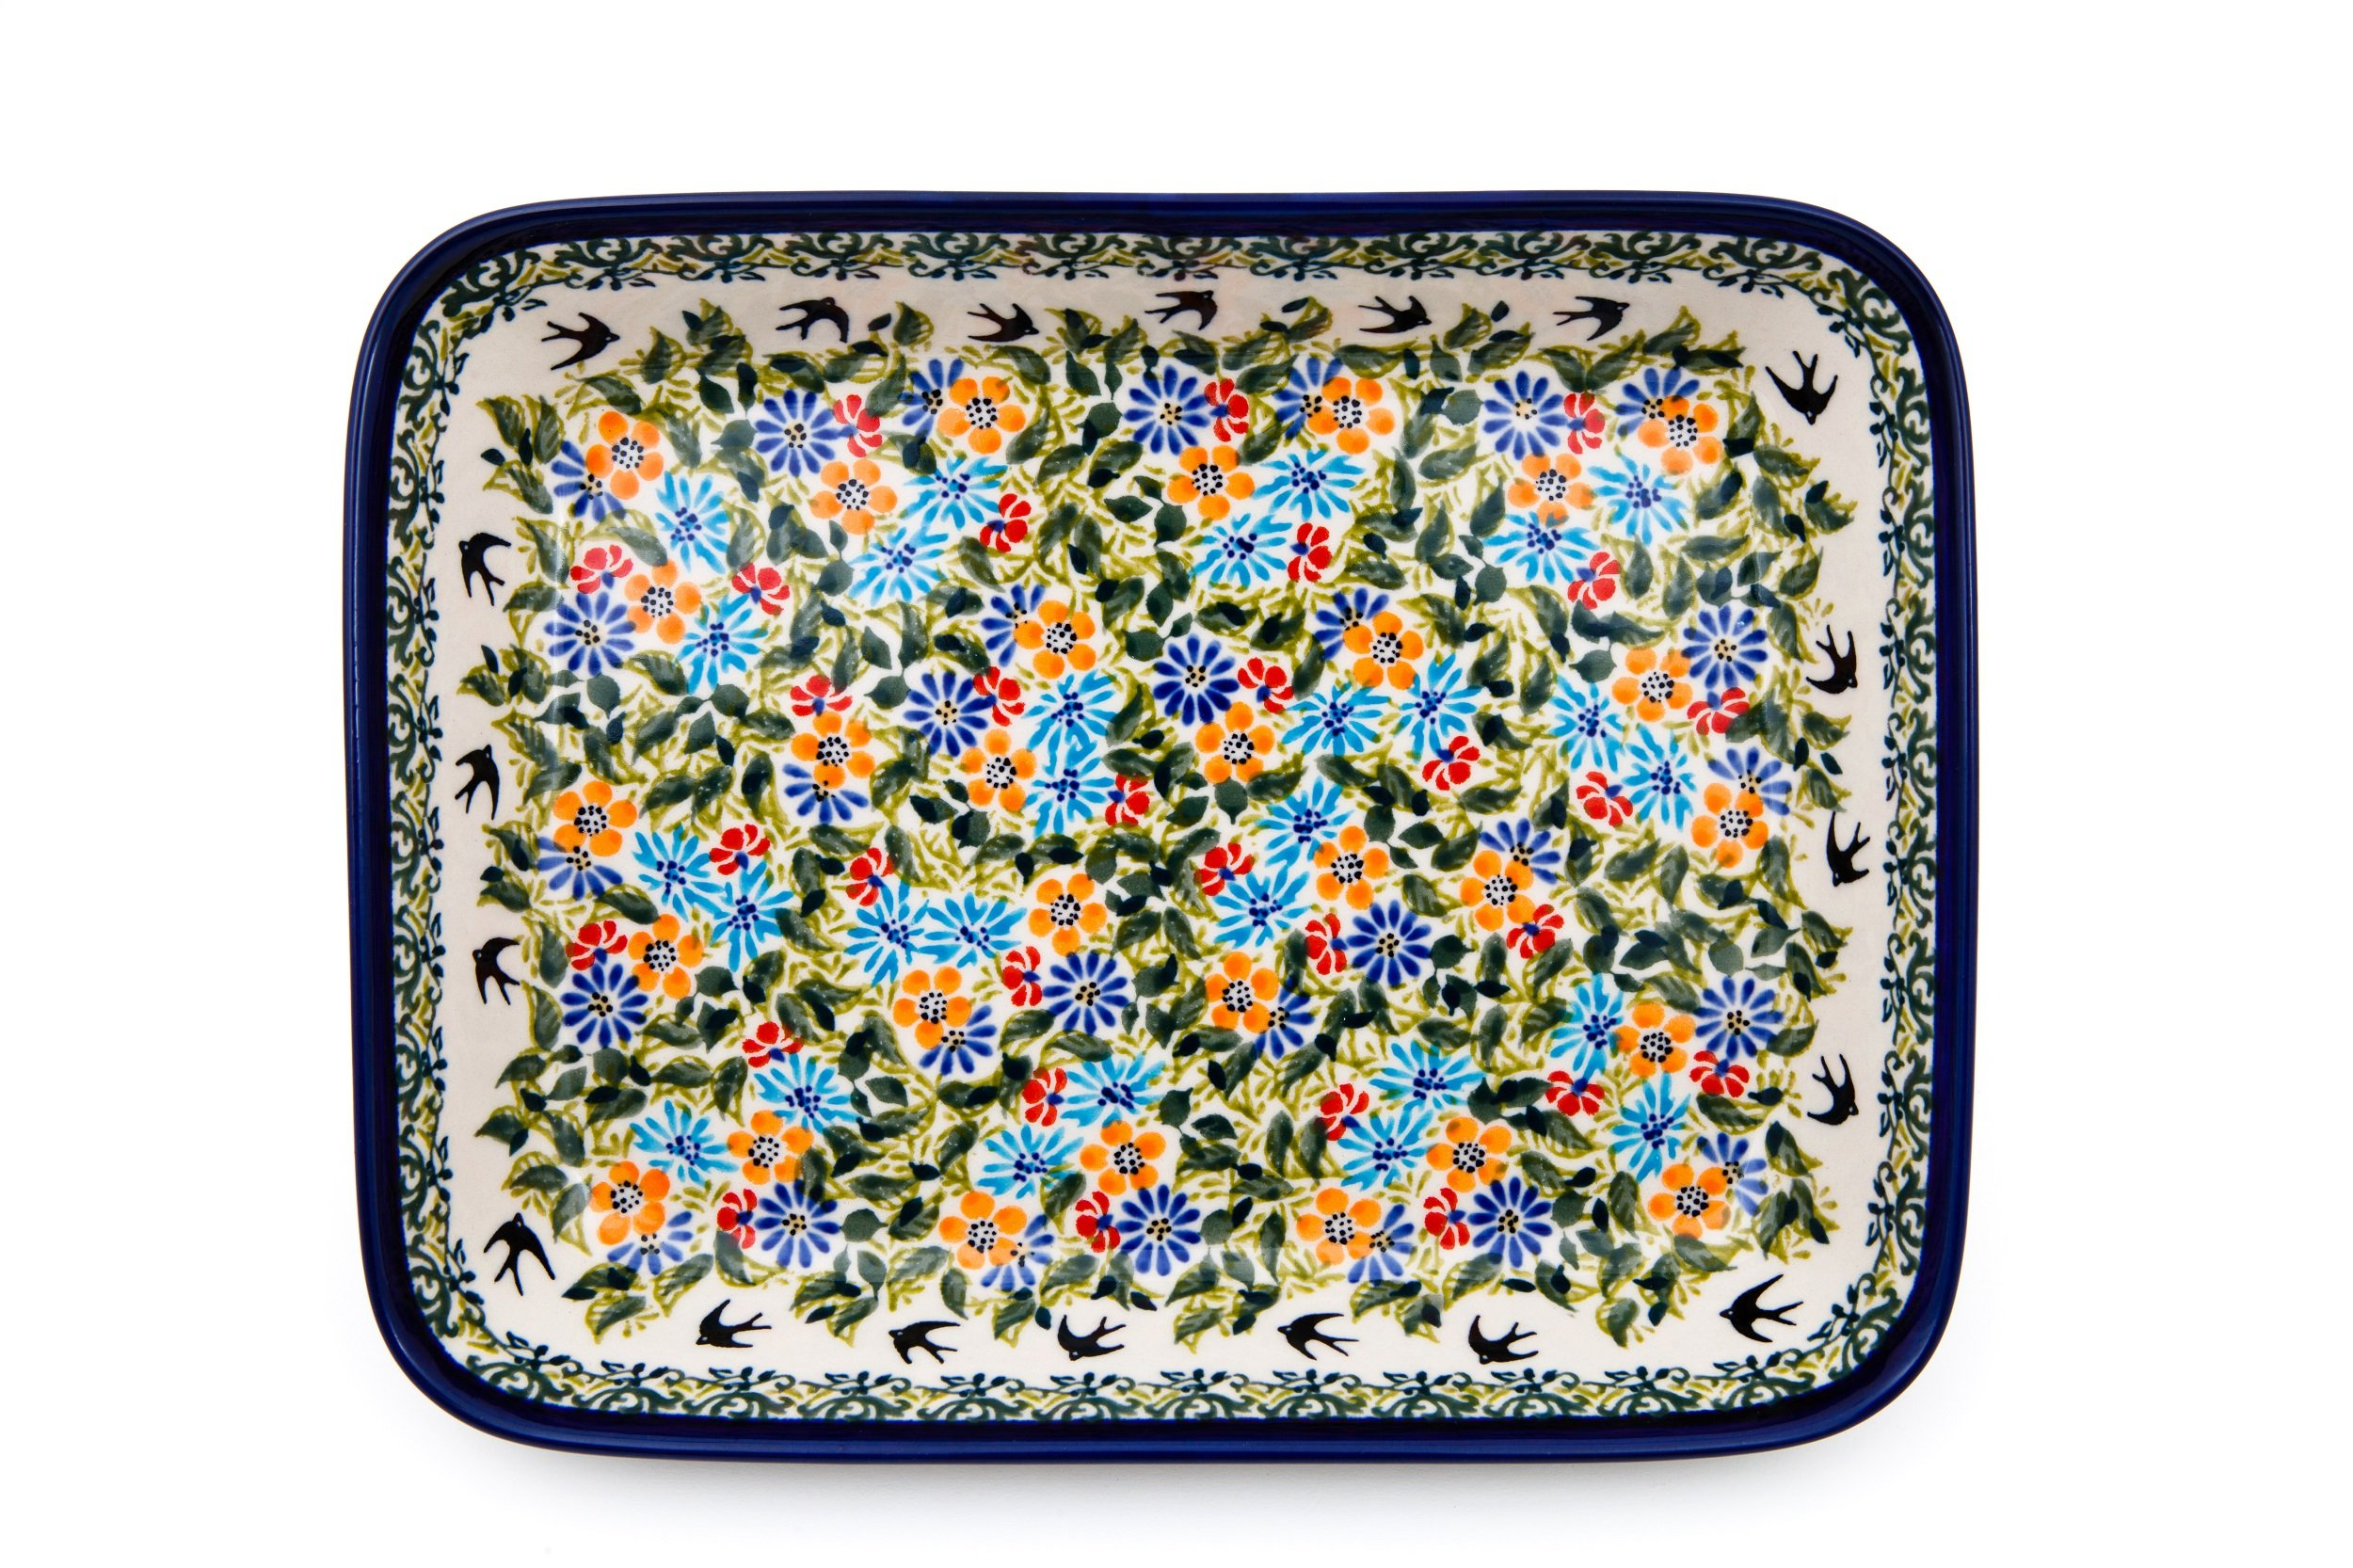 Hand-Decorated Polish Pottery Casserole Dish for 2People 25,5×19,5×4,5cm Premium Design DU182(L x W x H)